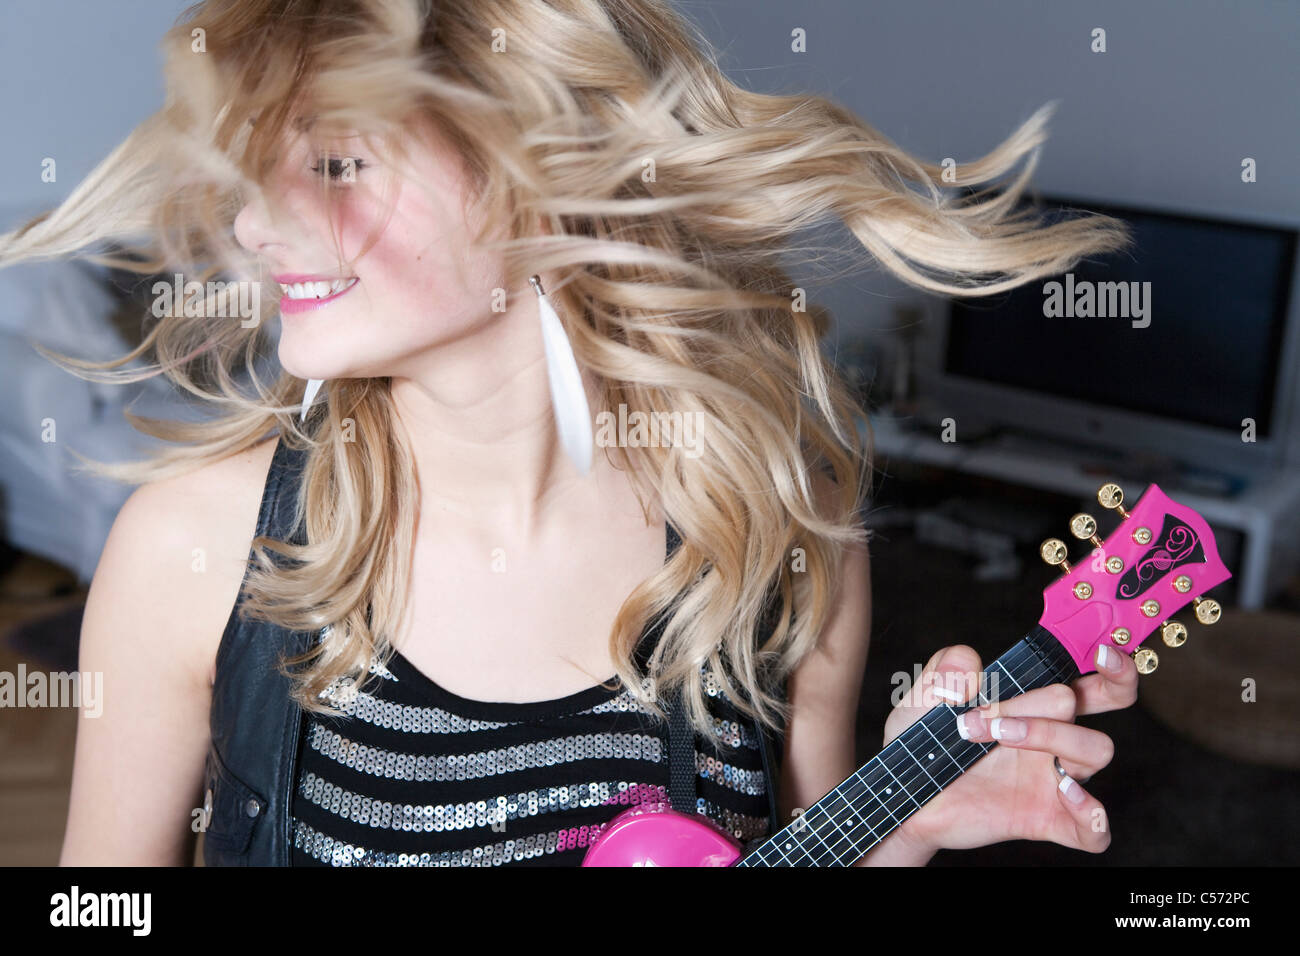 Teenage girl holding miniature guitar - Stock Image